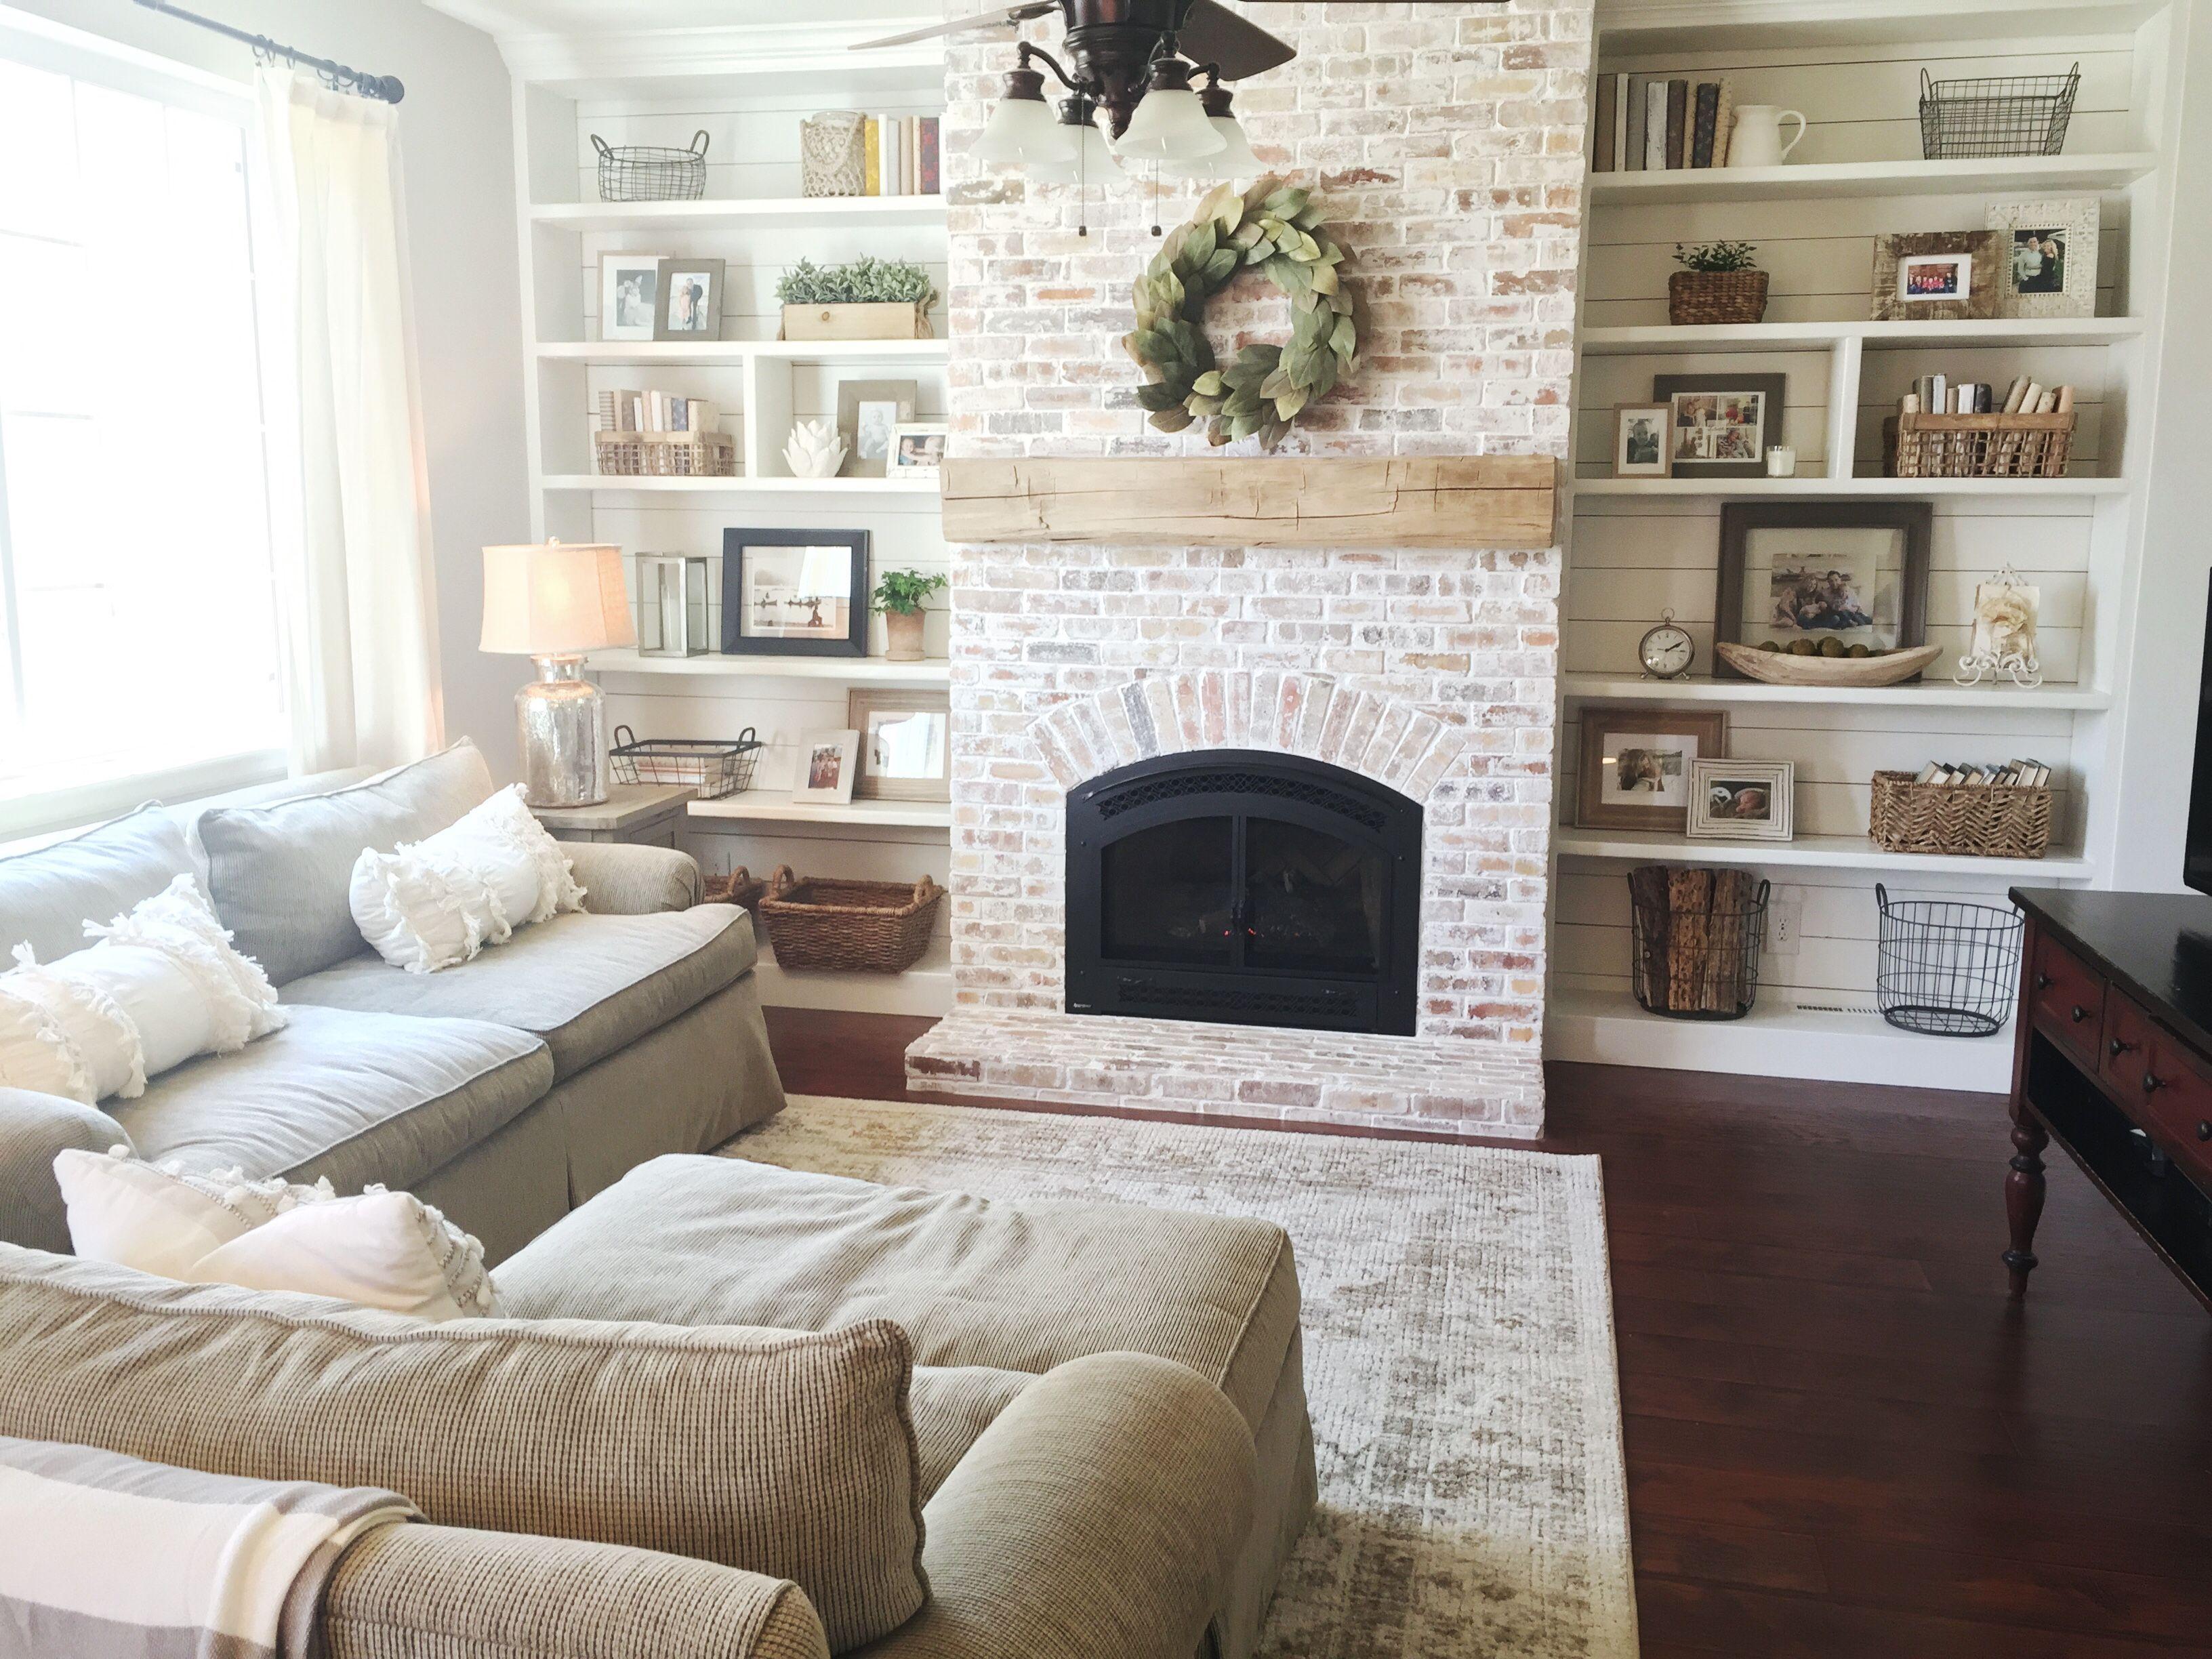 Built Ins, Shiplap, Whitewash Brick Fireplace, Bookshelf